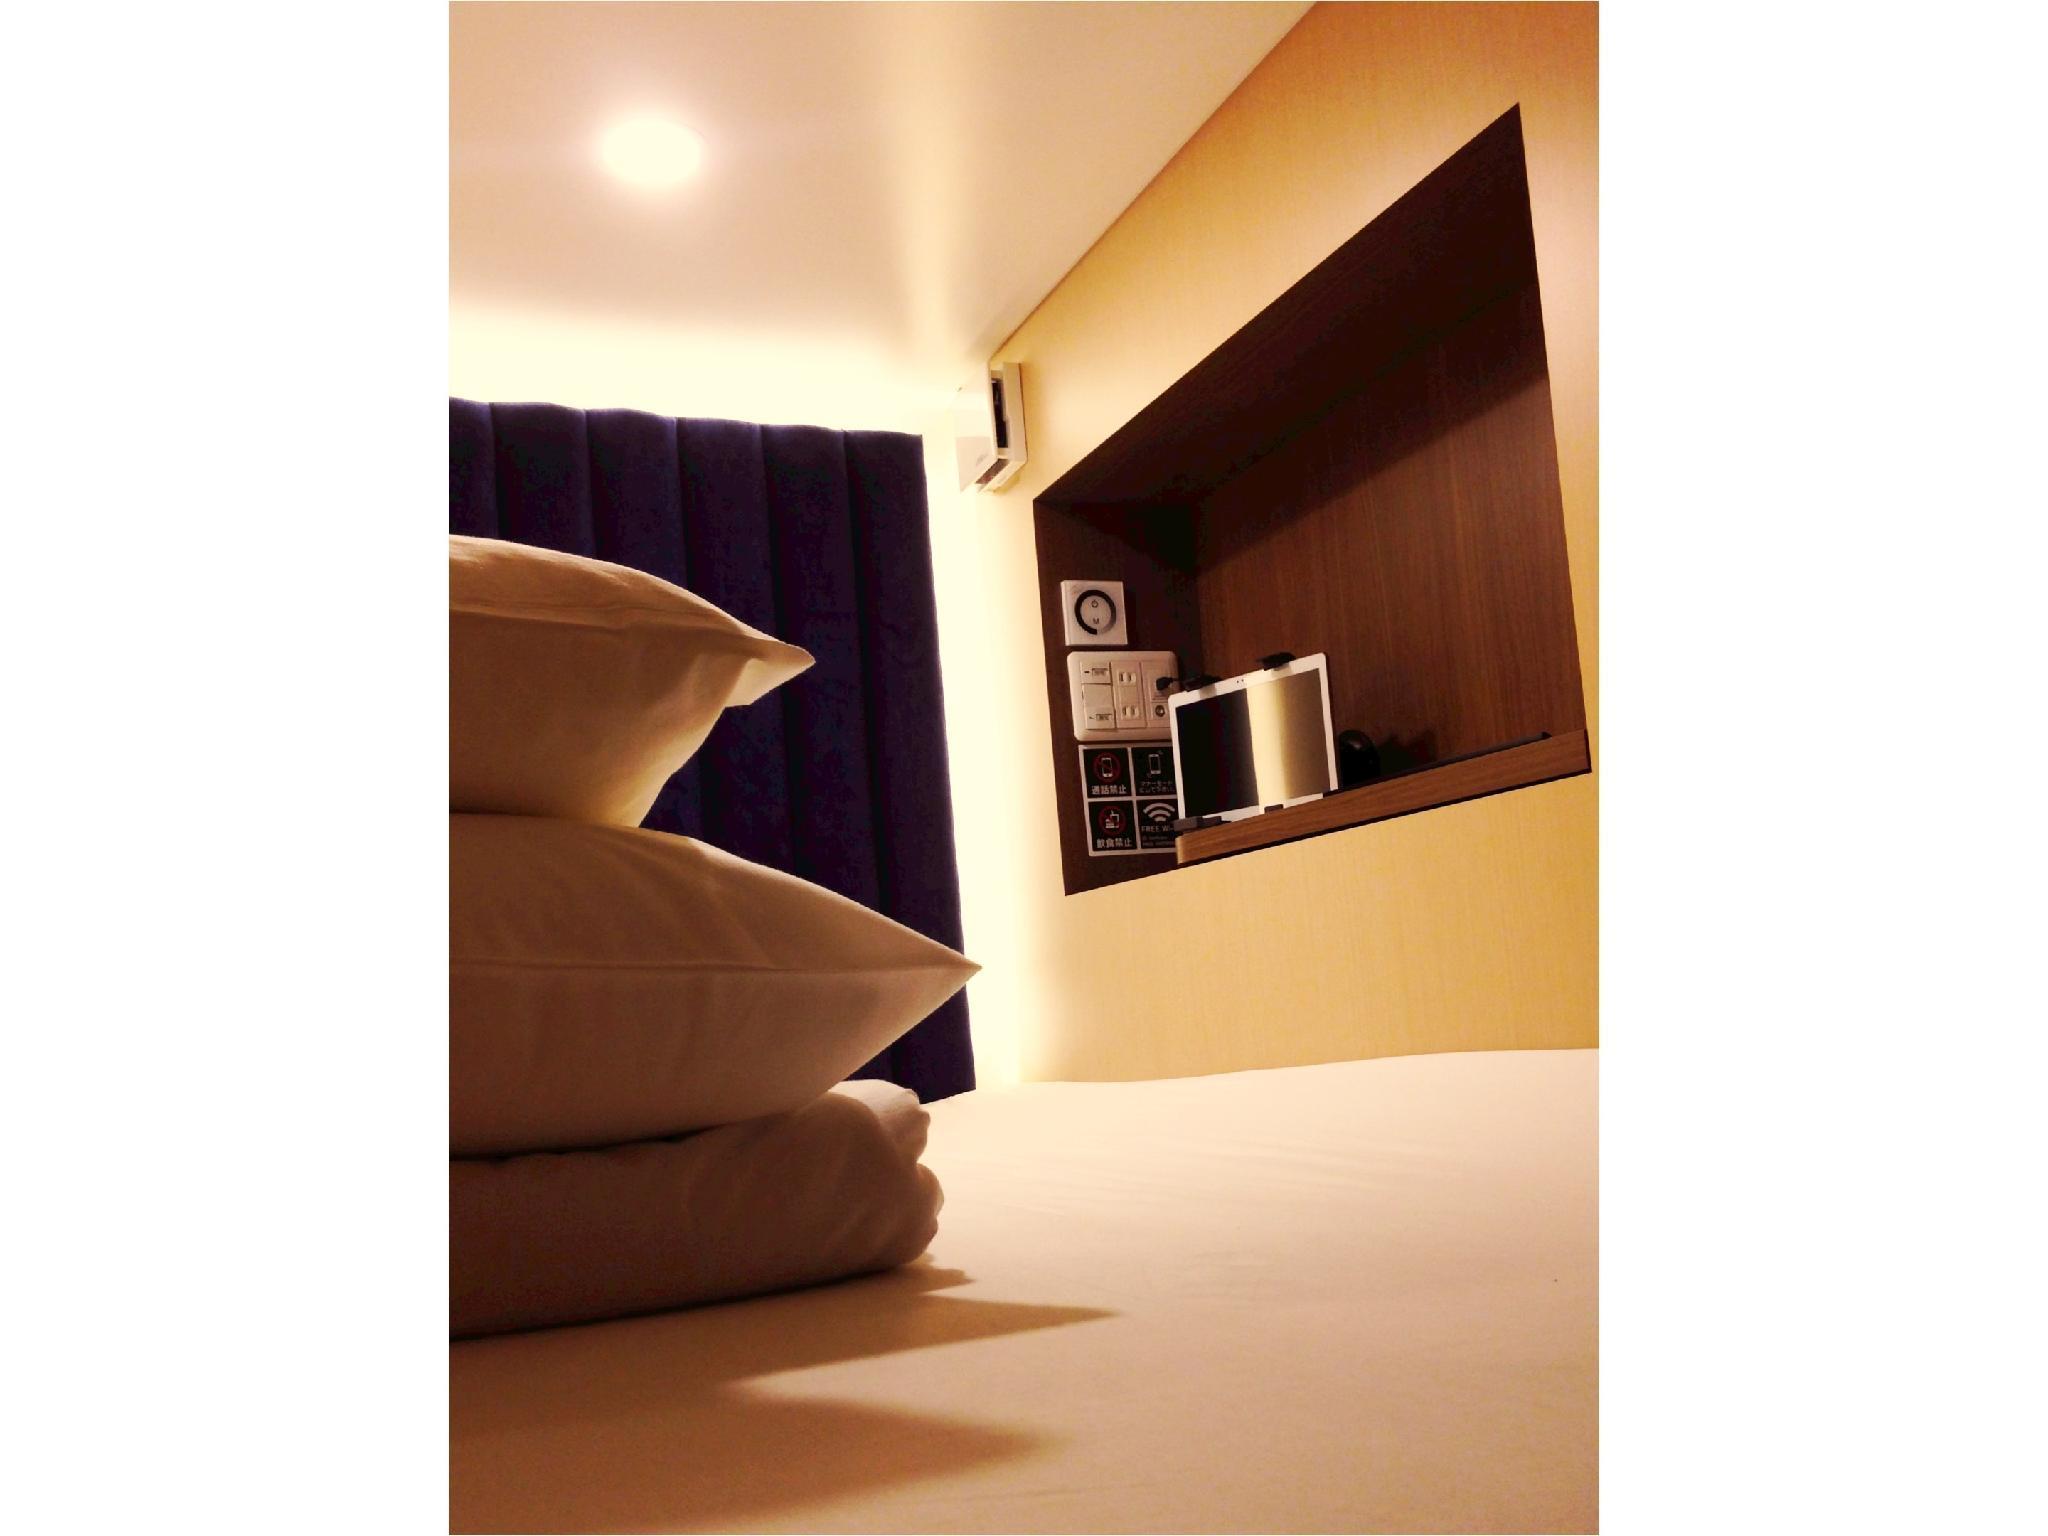 The Bed & Spa, Tokorozawa